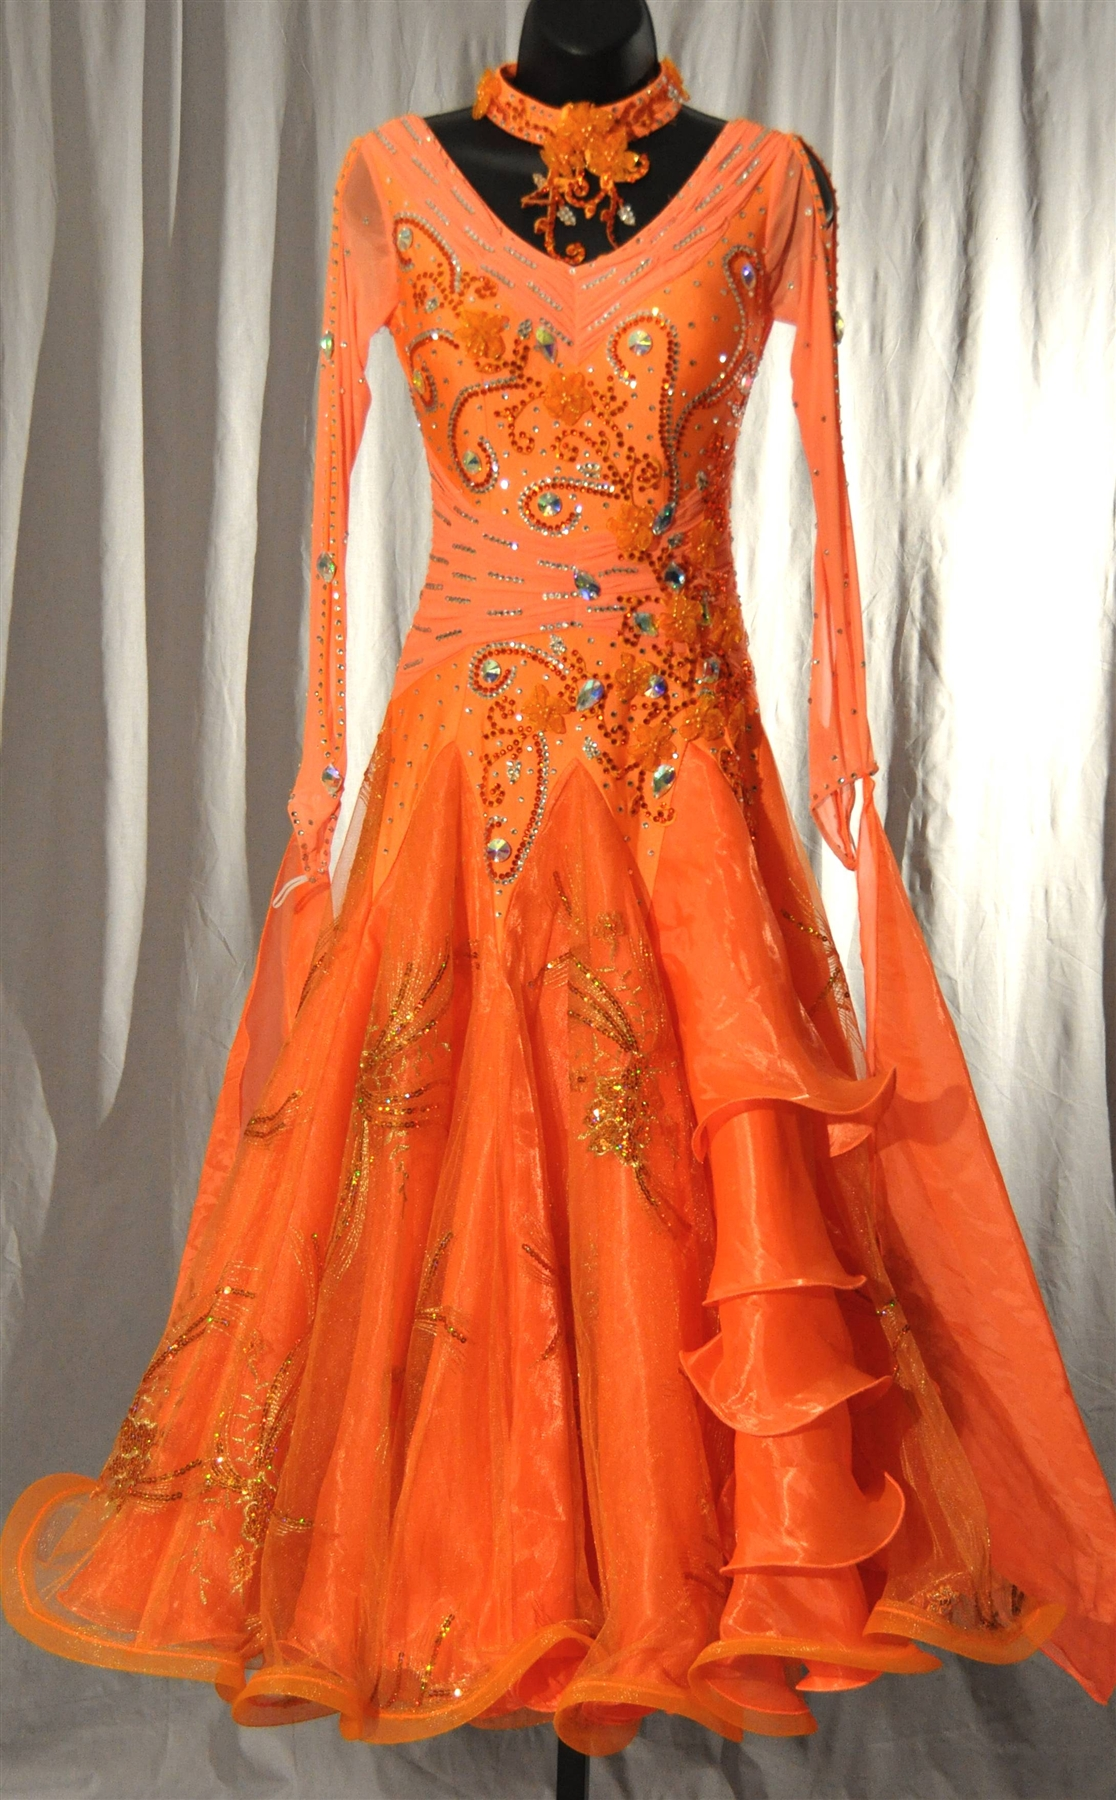 5f01caf74 Elegant Orange Mesh Sleeves Ballroom Dress